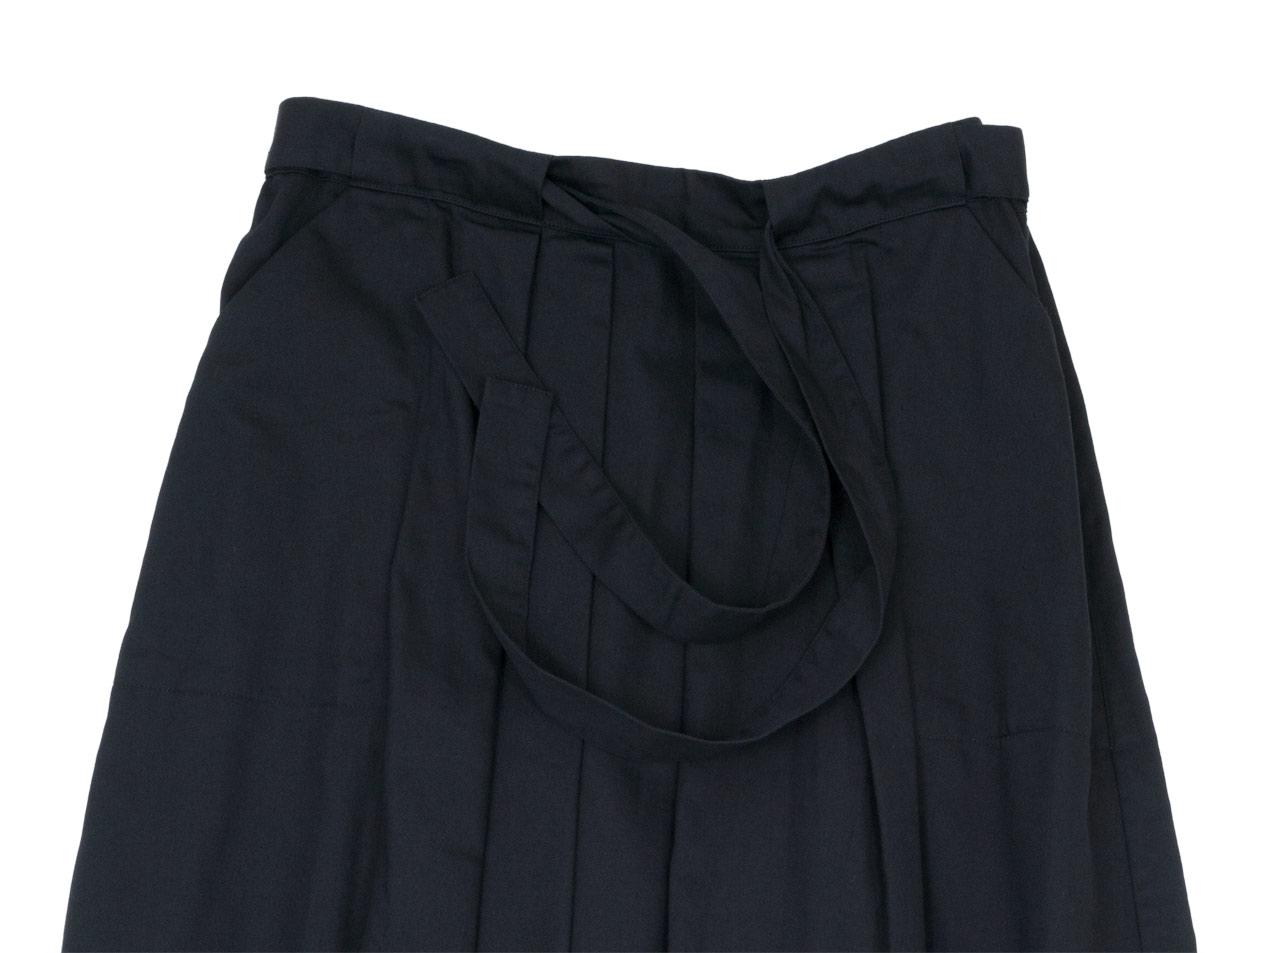 Atelier d'antan Certeau(セルトー) Ribbon Skirt